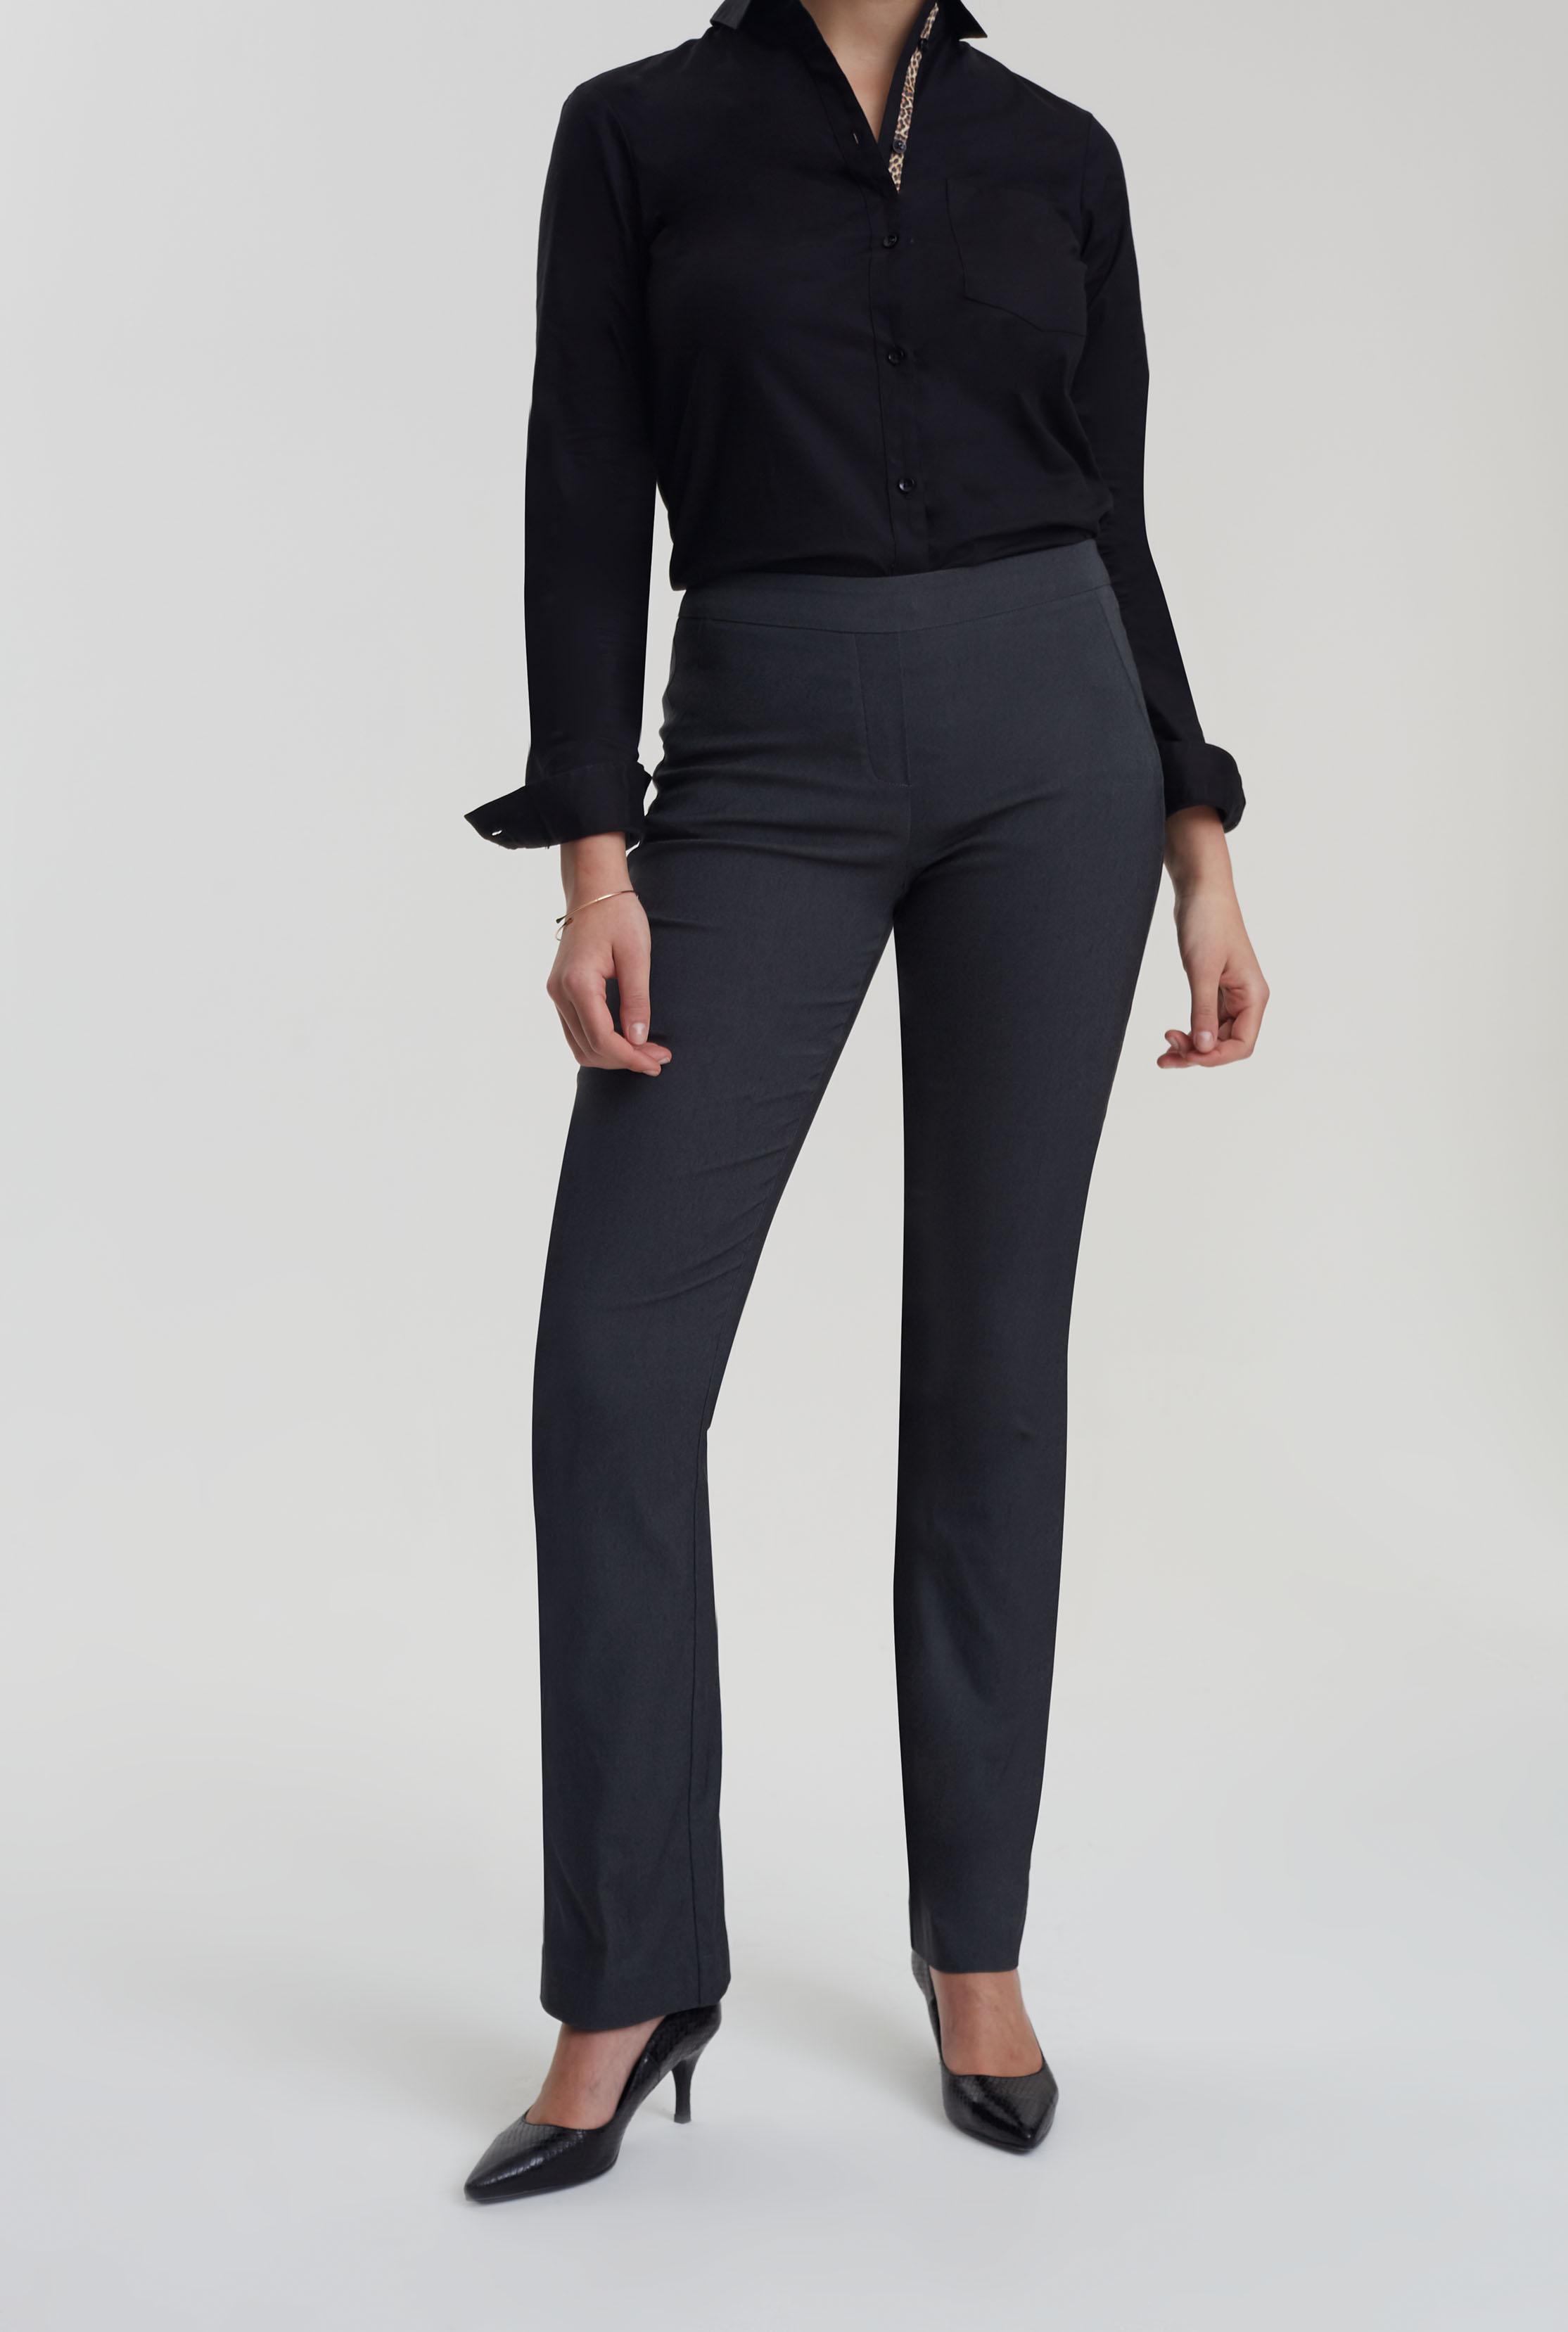 Charcoal Allegro Bootcut Trouser